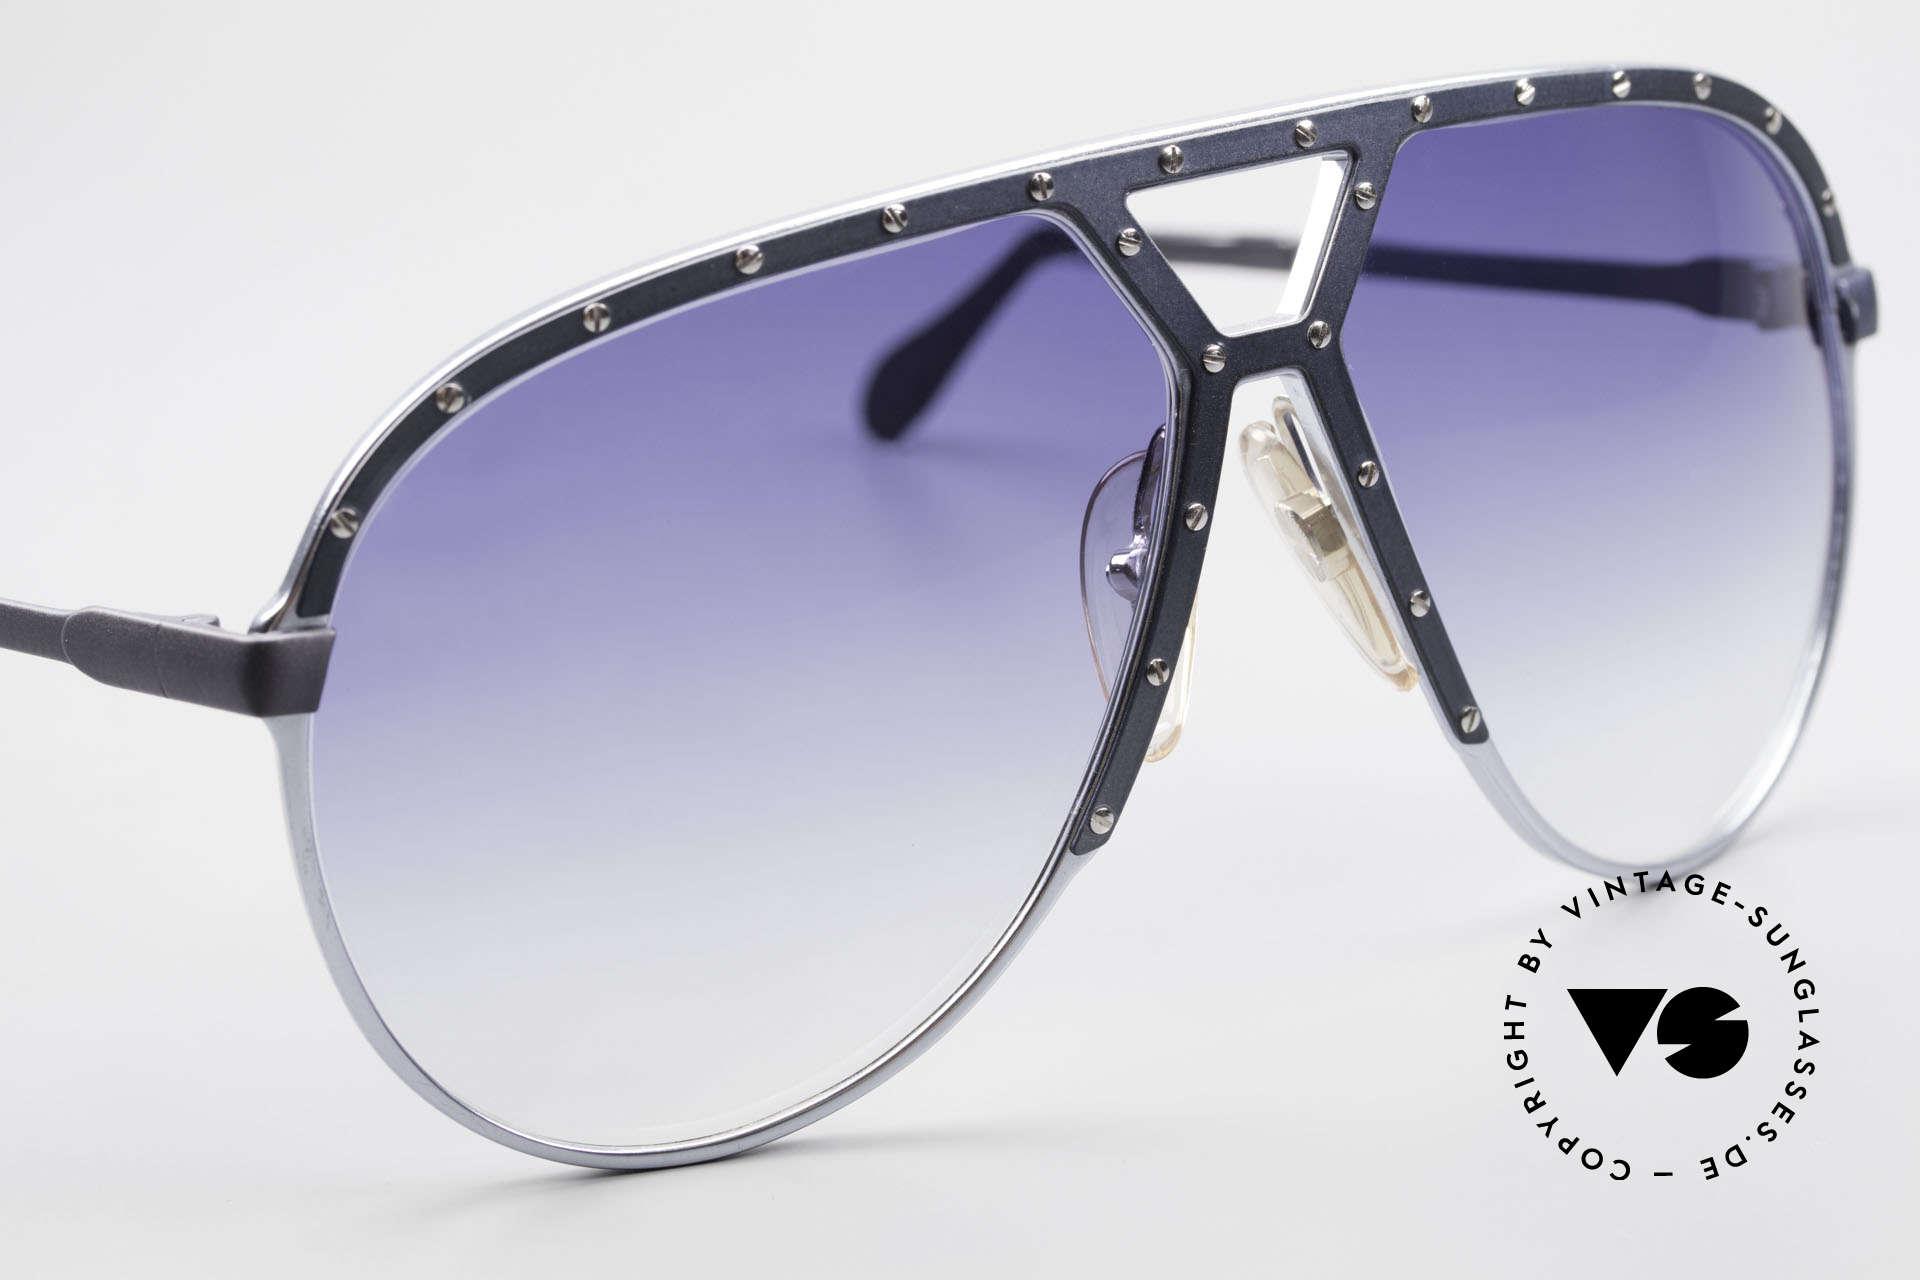 Alpina M1 Extra Large M1 80's Sunglasses, unworn (with dark blue sun lenses) and Bvlgari case, Made for Men